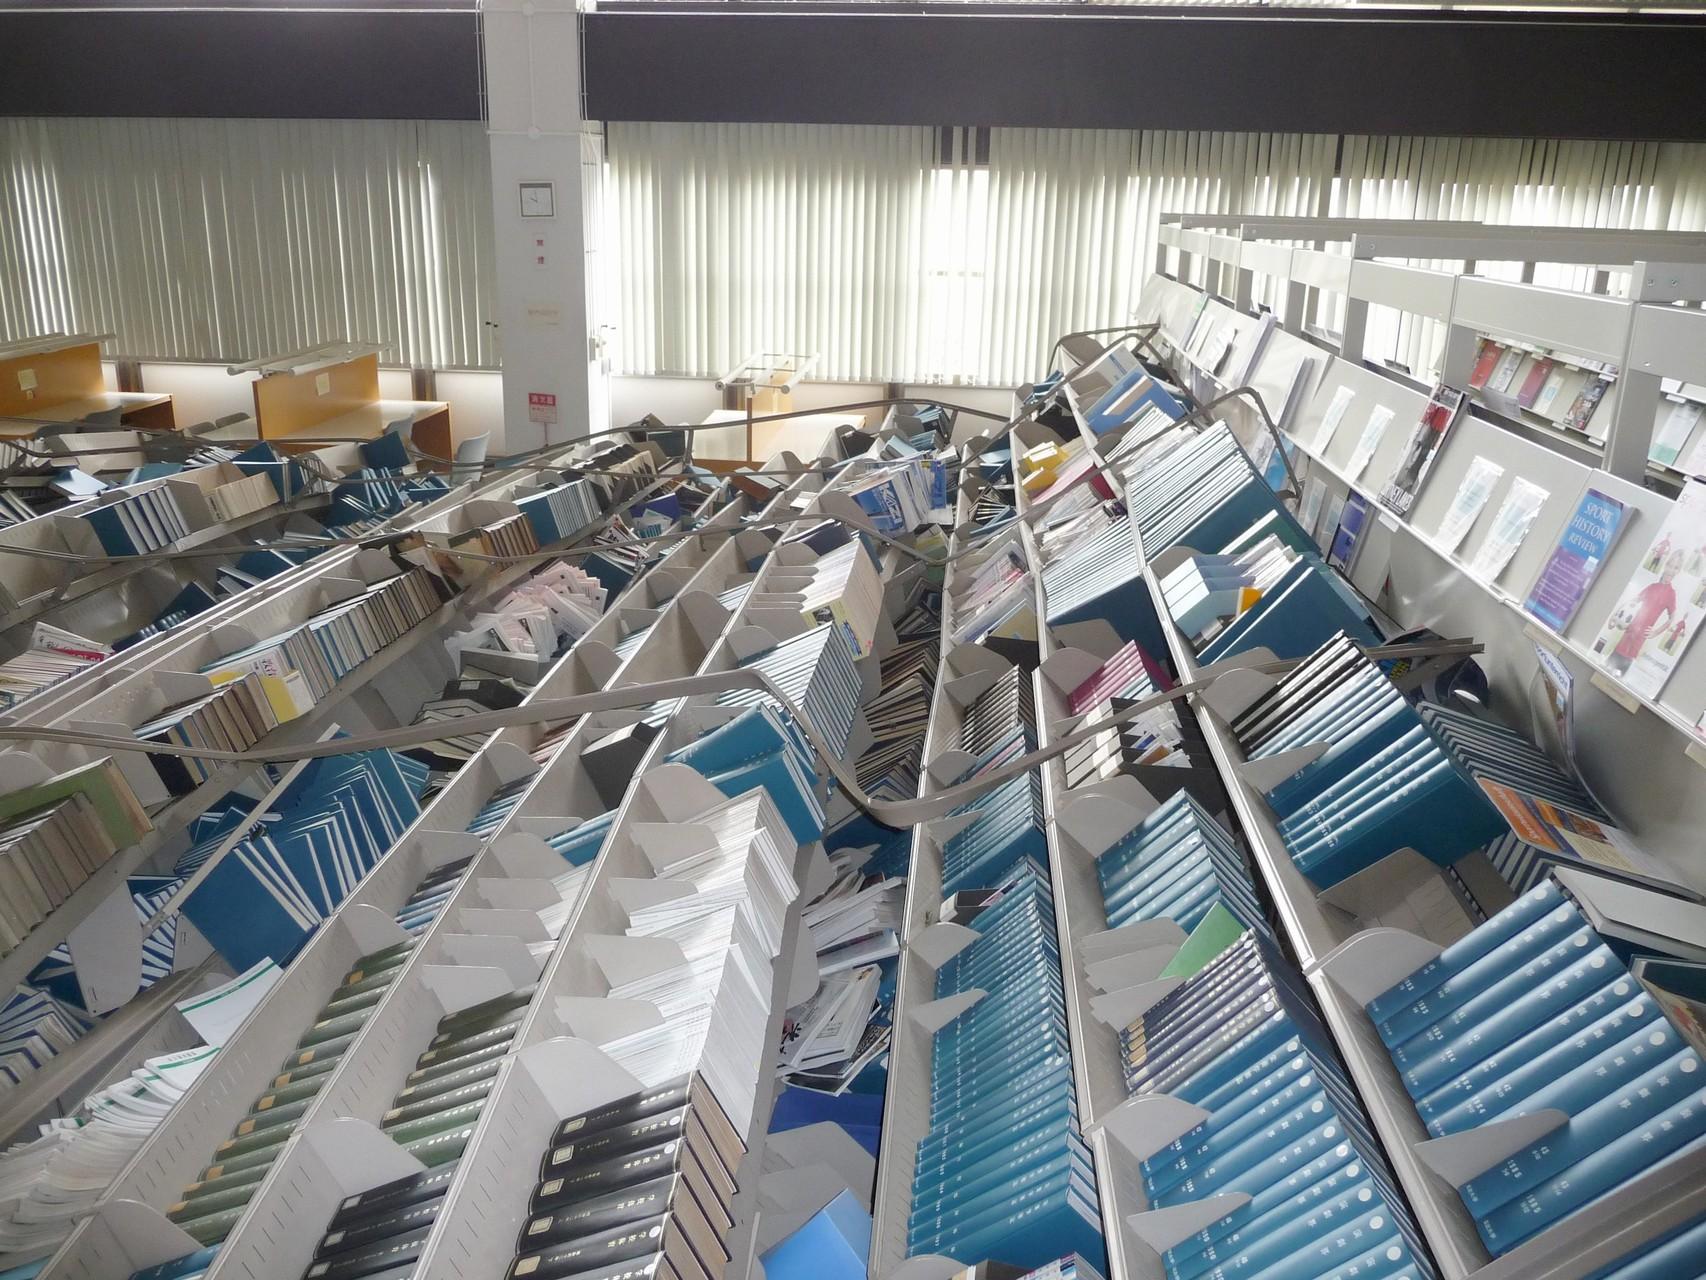 東日本大震災時の図書館の被災状況(筑波大学附属図書館HPより)